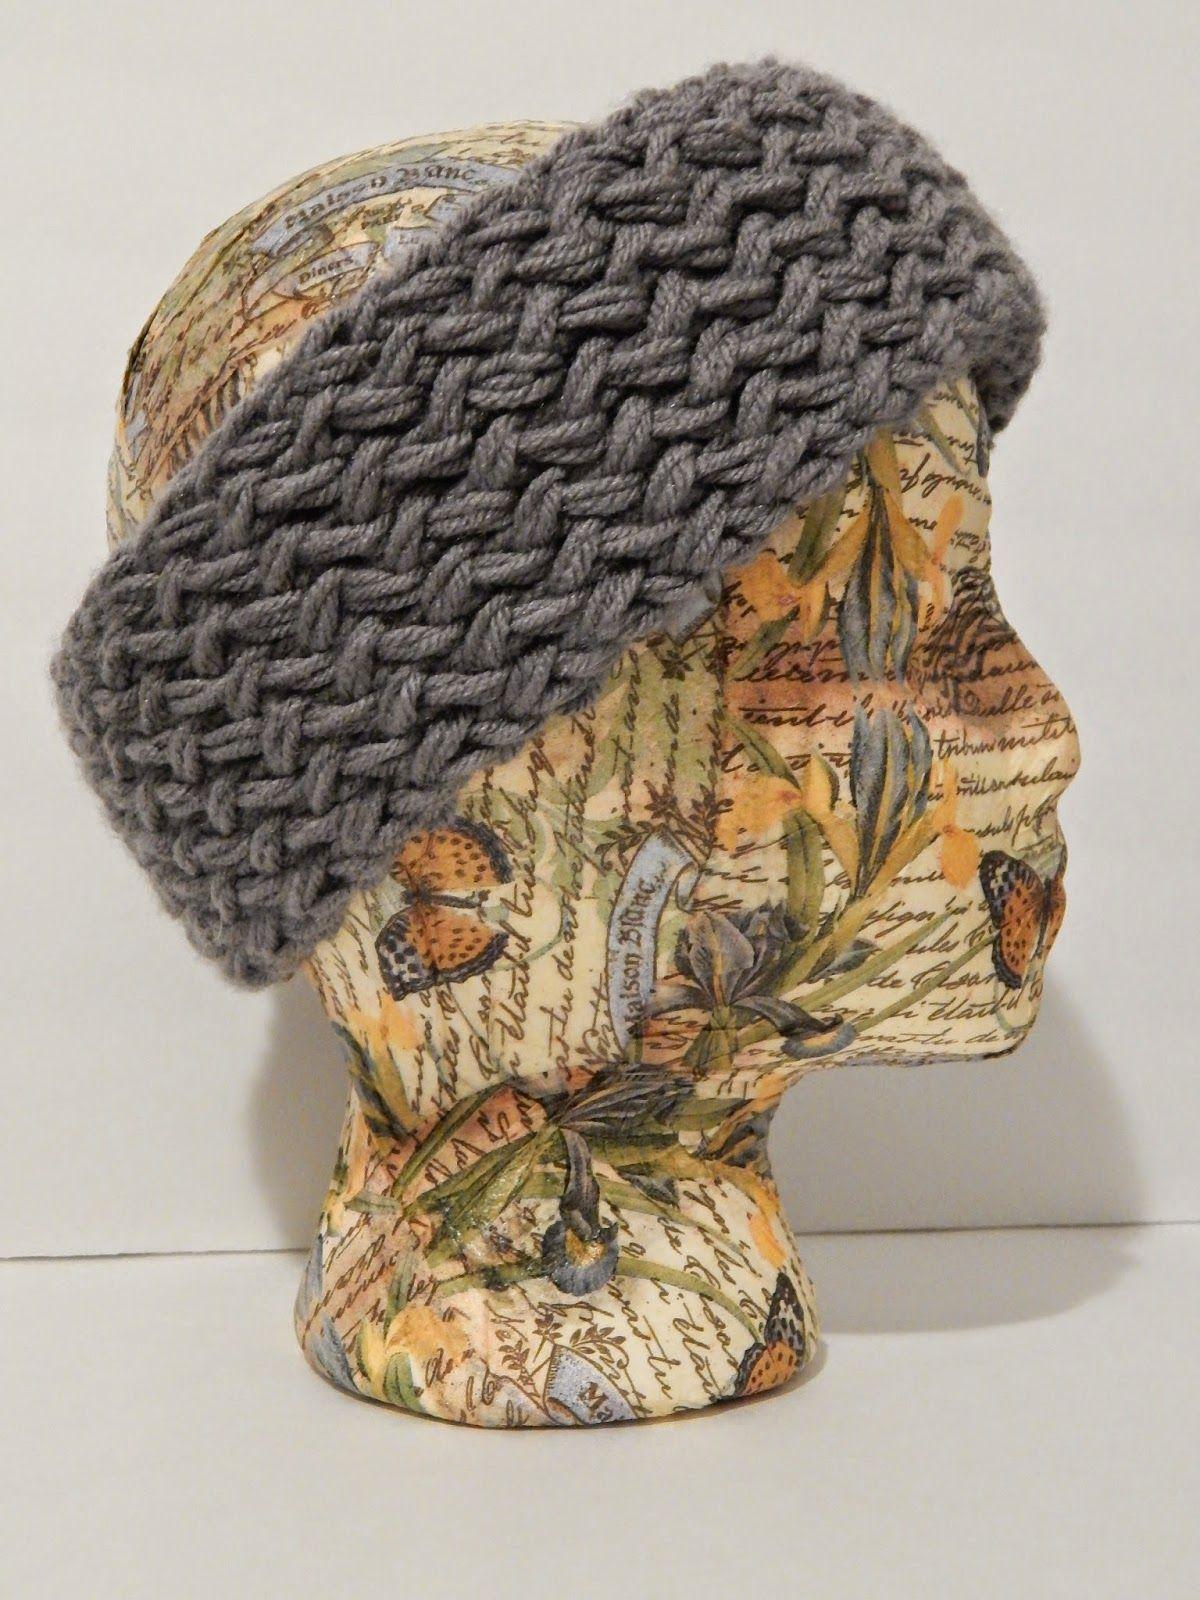 Jovial Knits Loom Knit Reversible Super Chunky Headband